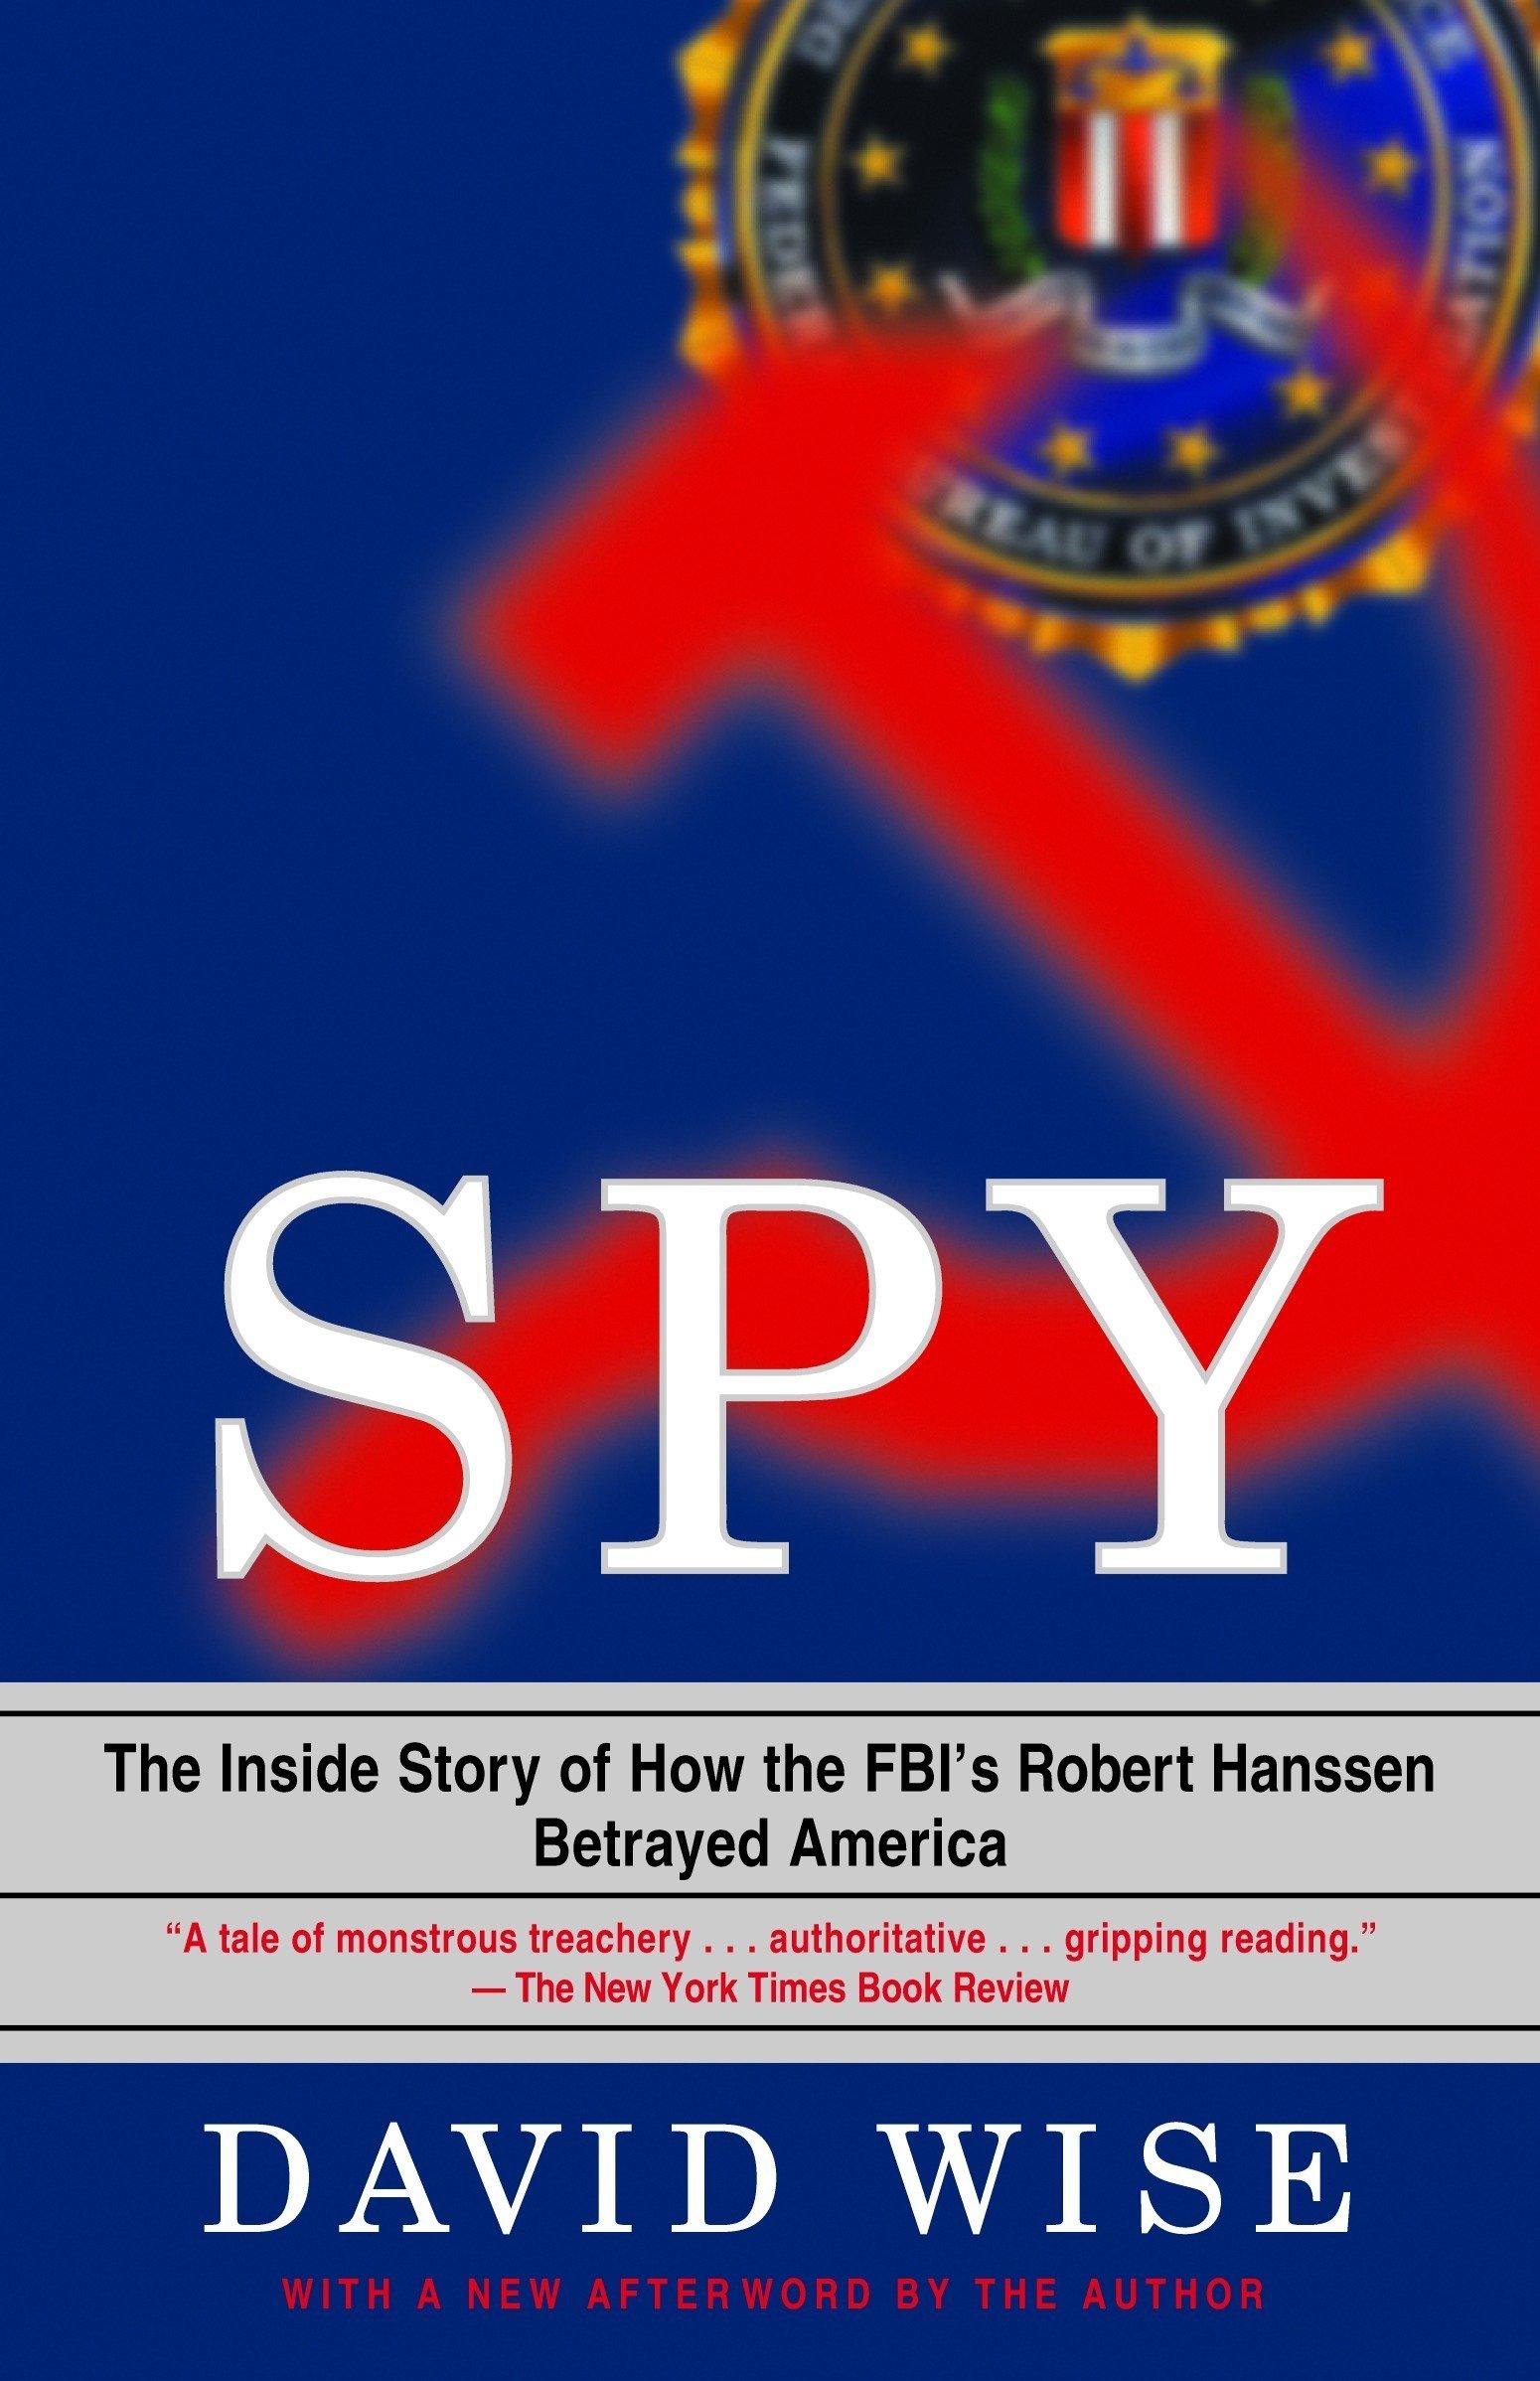 Spy: The Inside Story of How the FBI's Robert Hanssen Betrayed America ebook